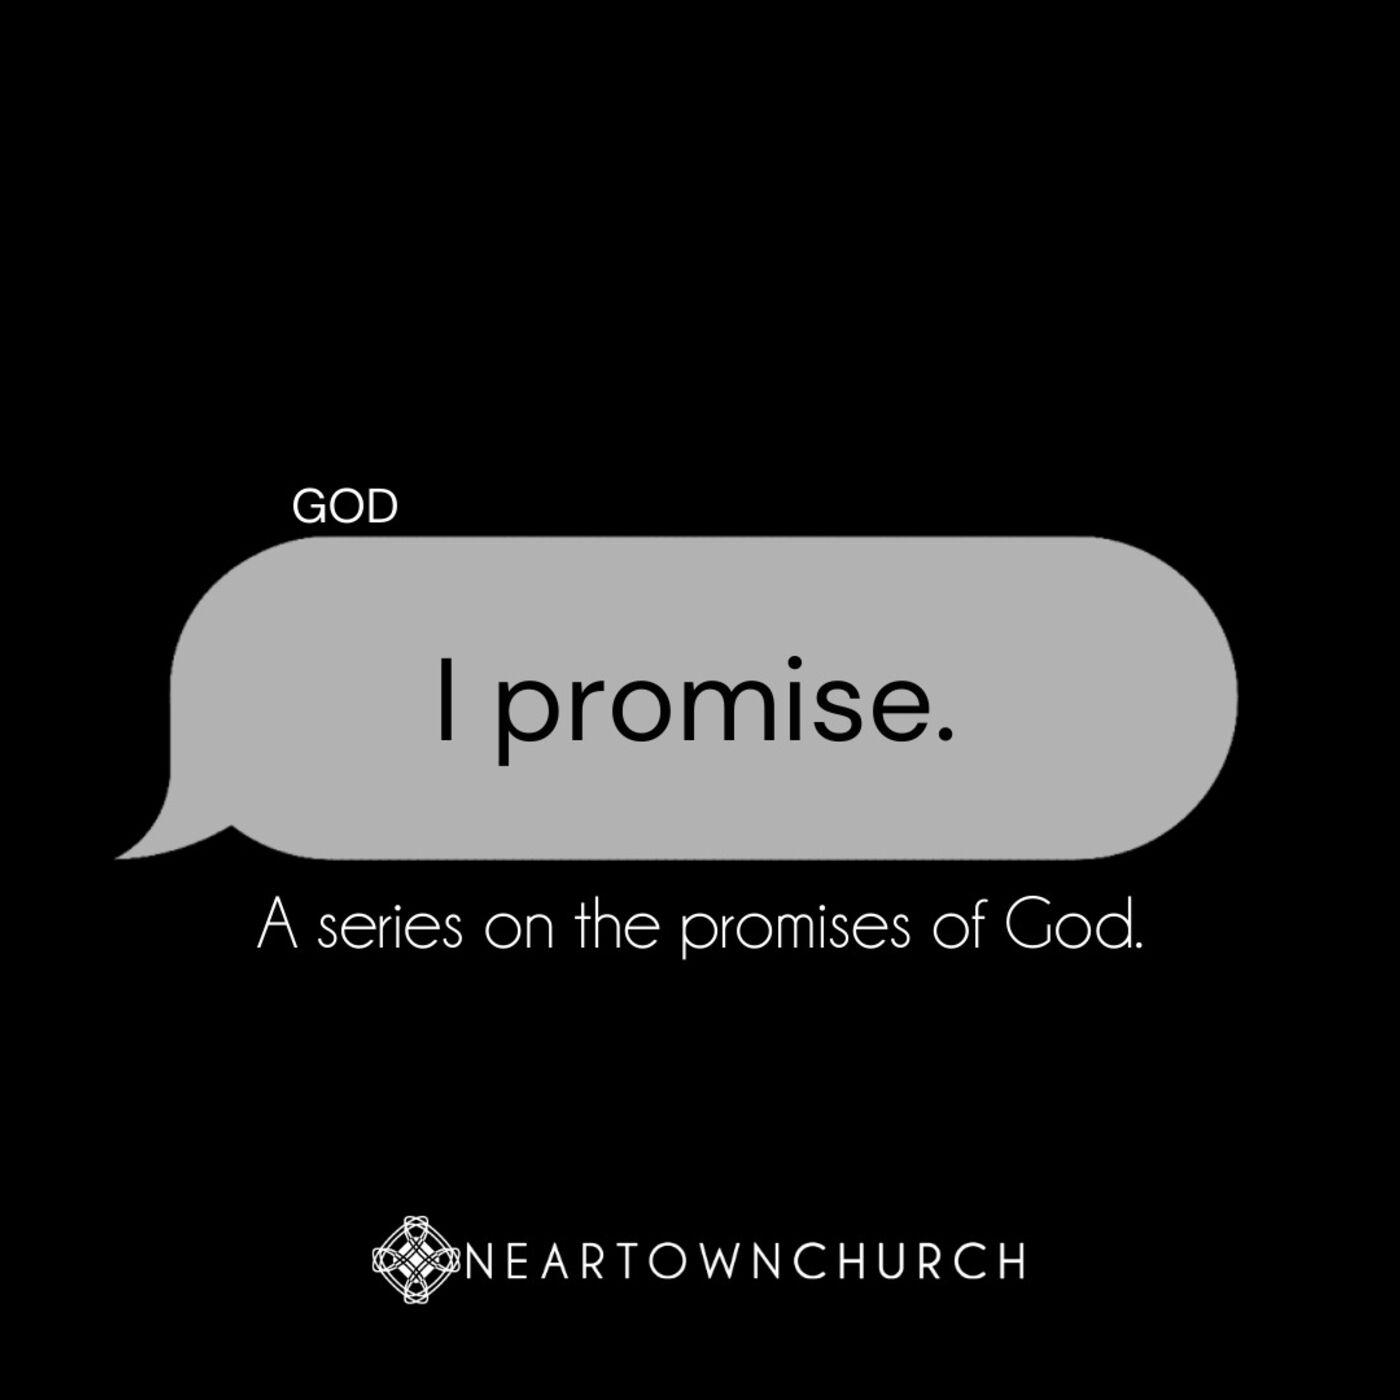 I promise. - 8.16.2020